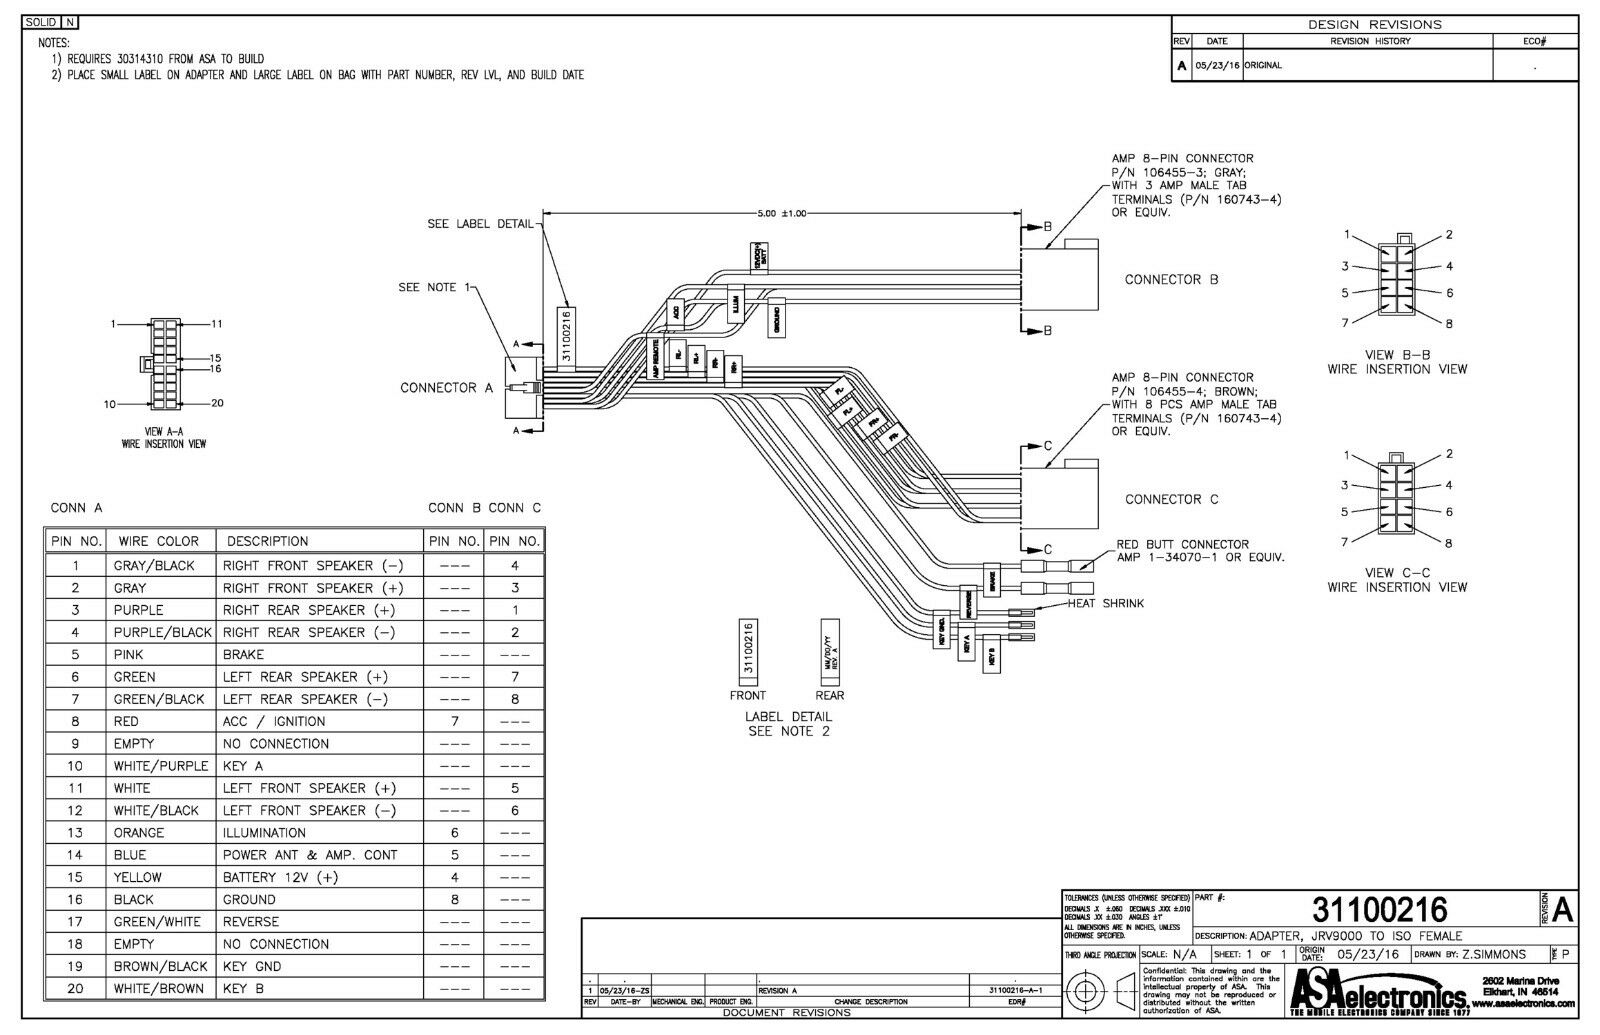 Jensen 8 Din Wiring Diagram | Wiring Diagram on